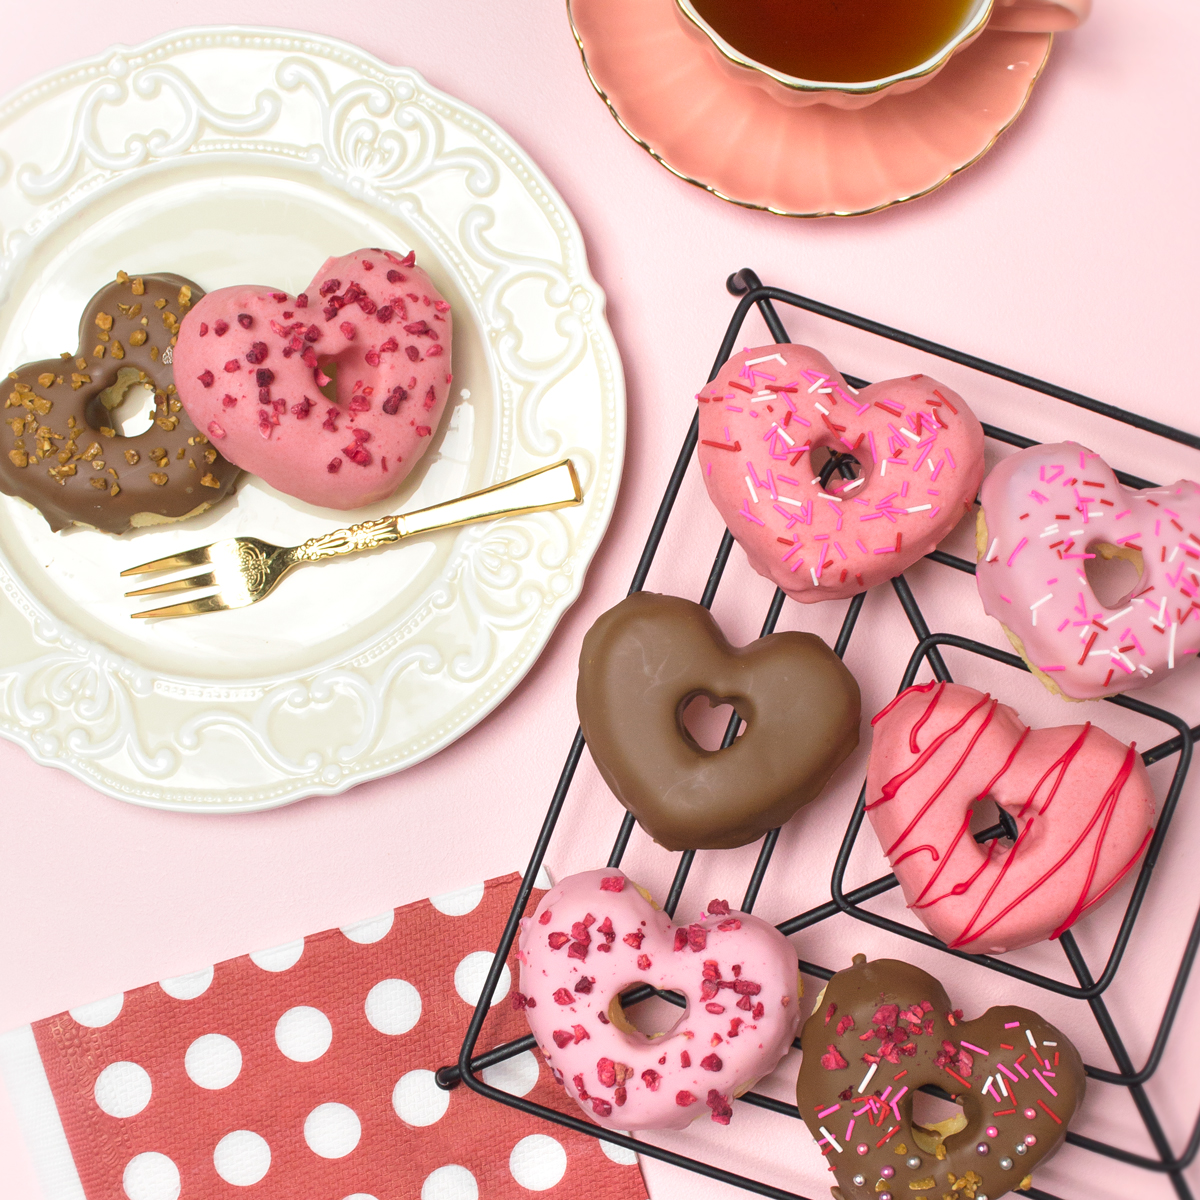 <center>ホットケーキミックス&レンジで簡単レシピ!揚げないハート型ドーナツの作り方 <br><small>Hotcake Heart Donuts</small></center>